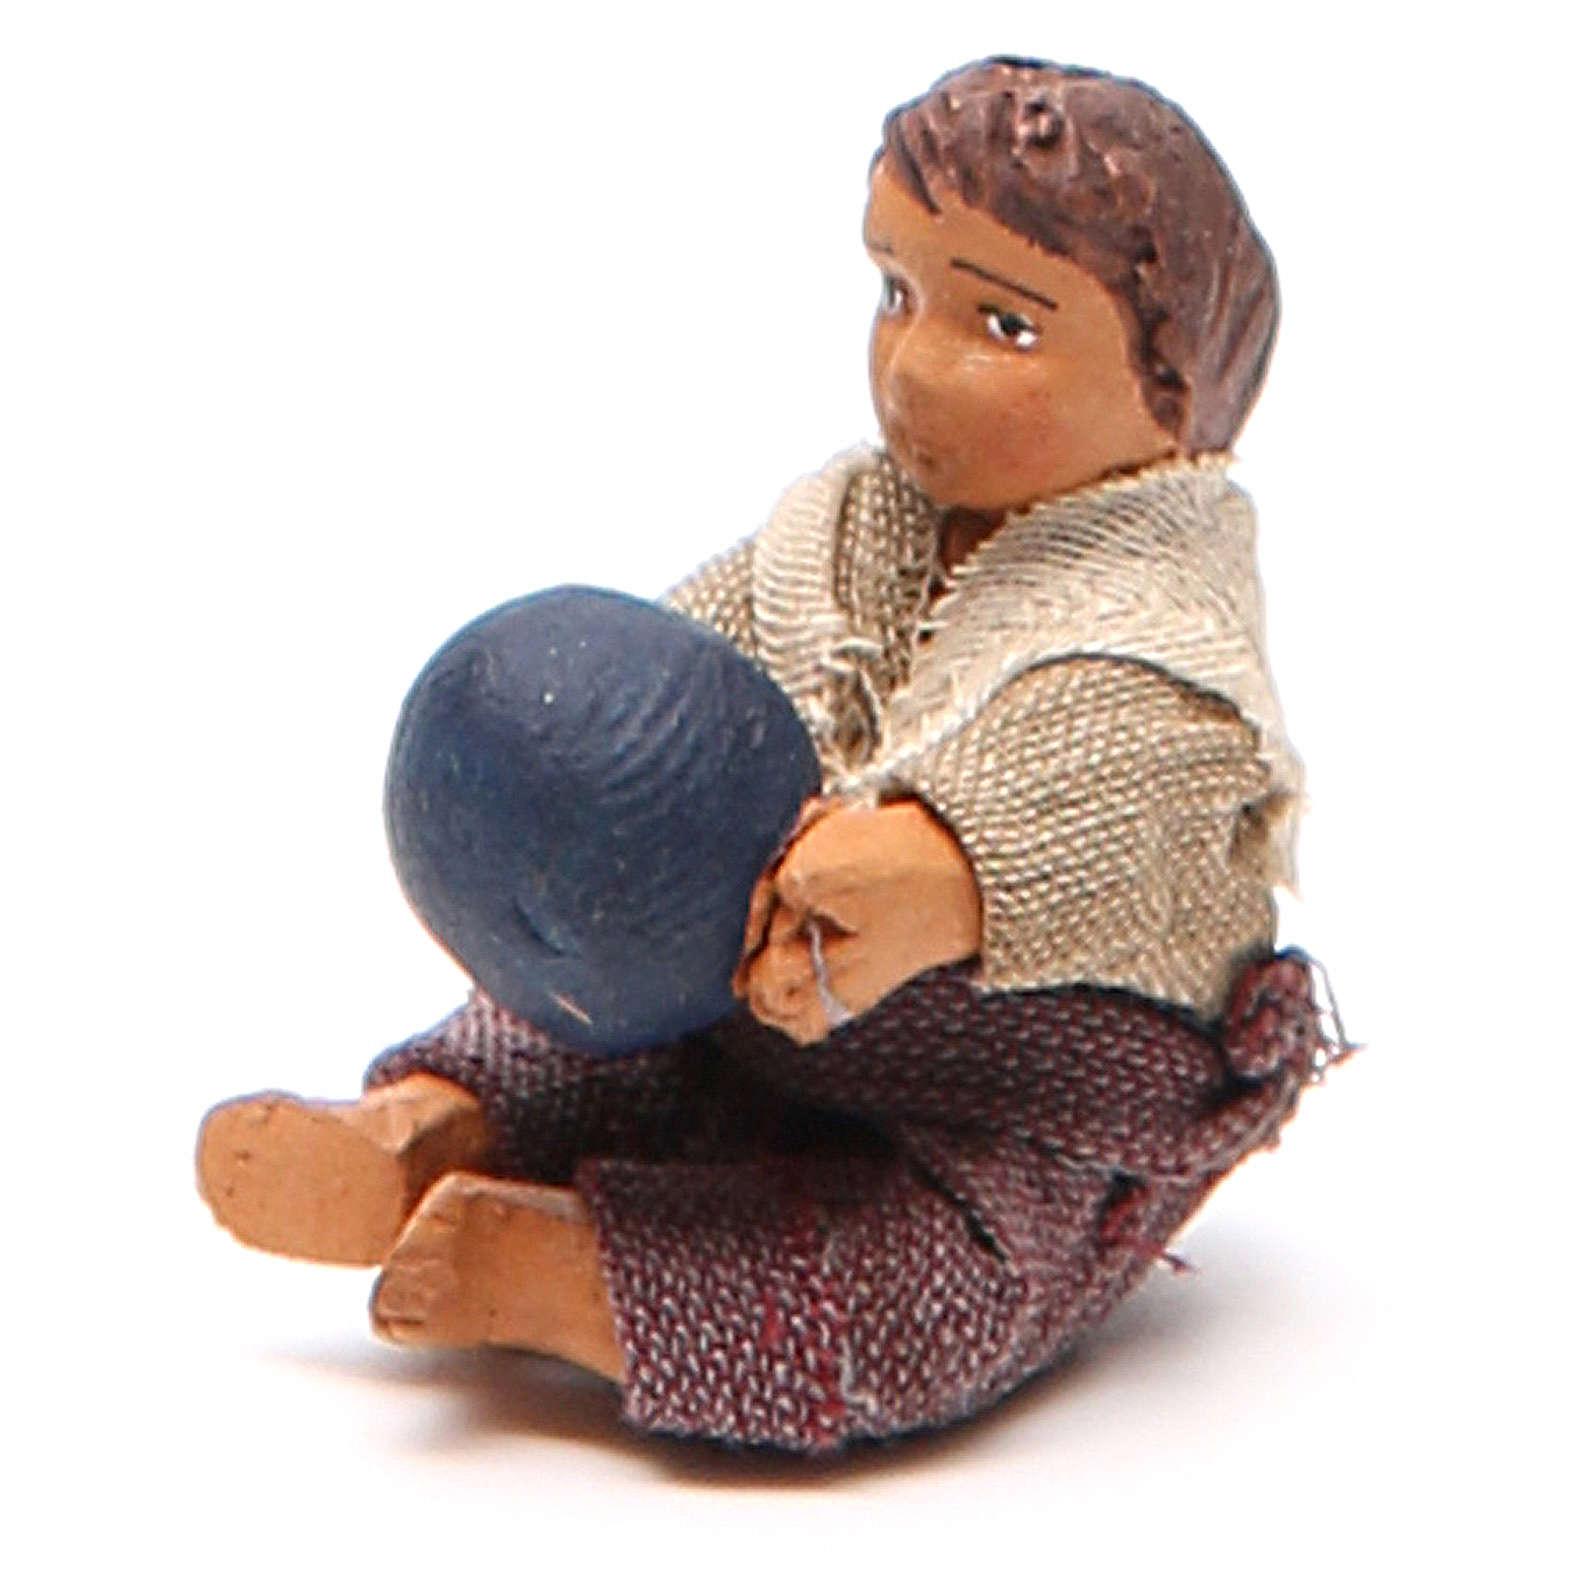 Little boy sitting with ball 10cm neapolitan Nativity 4